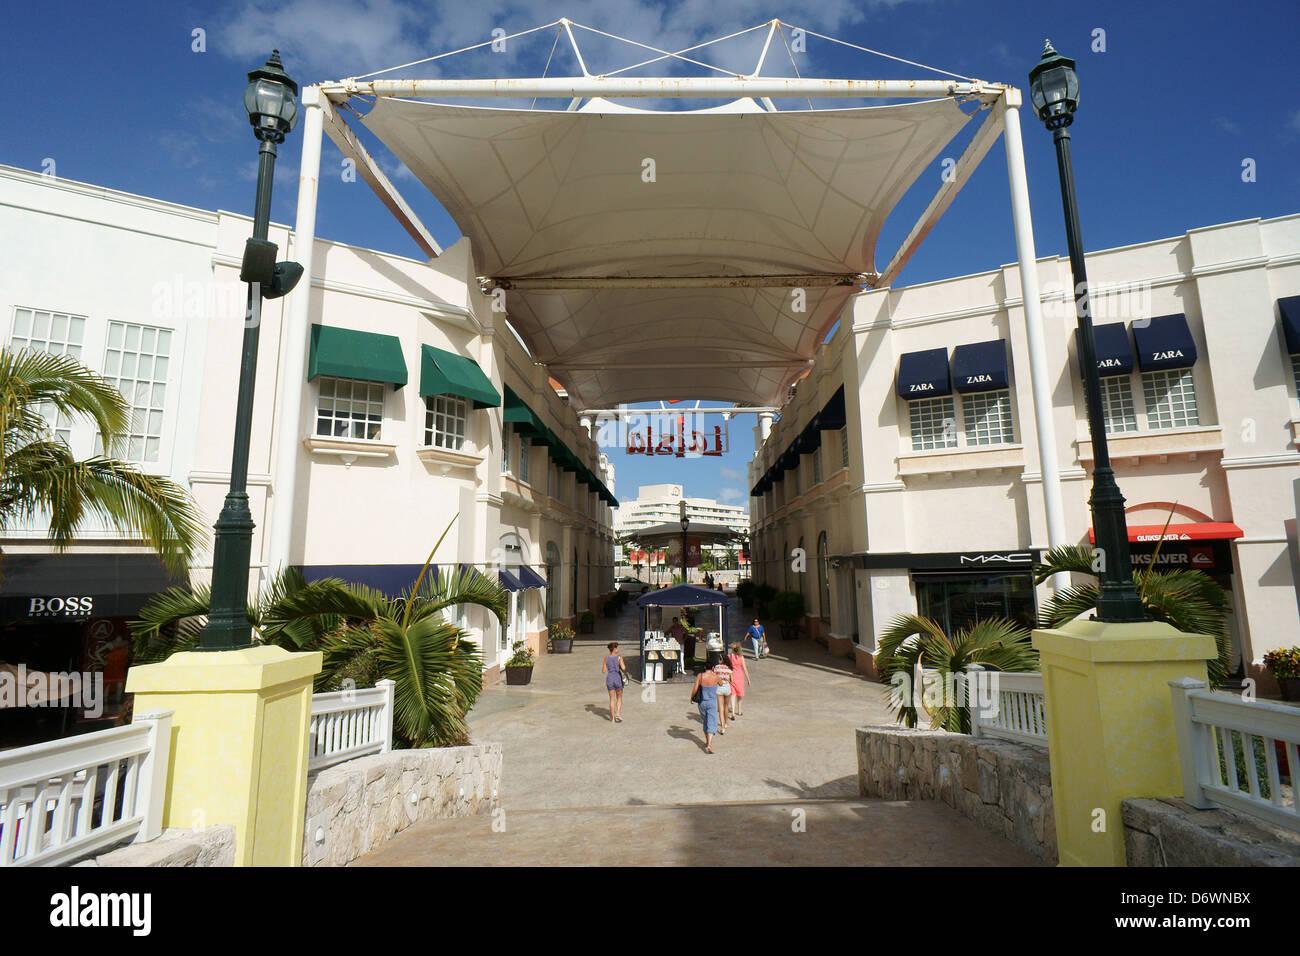 Interior and entrance, La Isla Shopping Village shopping mall in the Zona Hotelera, Cancun, Quintana Roo, Mexico Stock Photo